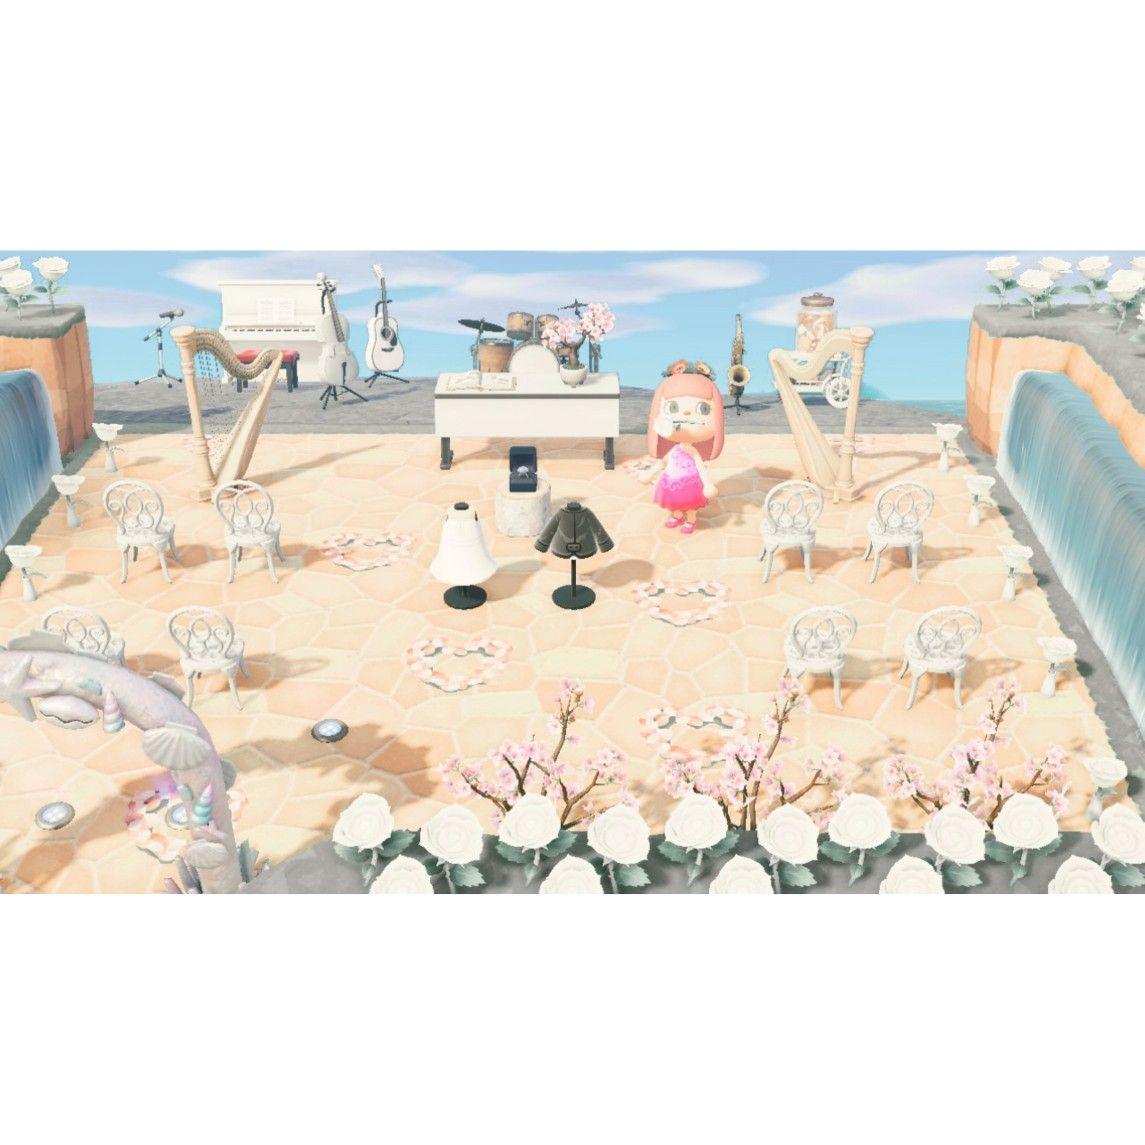 Acnh Wedding In 2020 Animal Crossing Photo Instagram